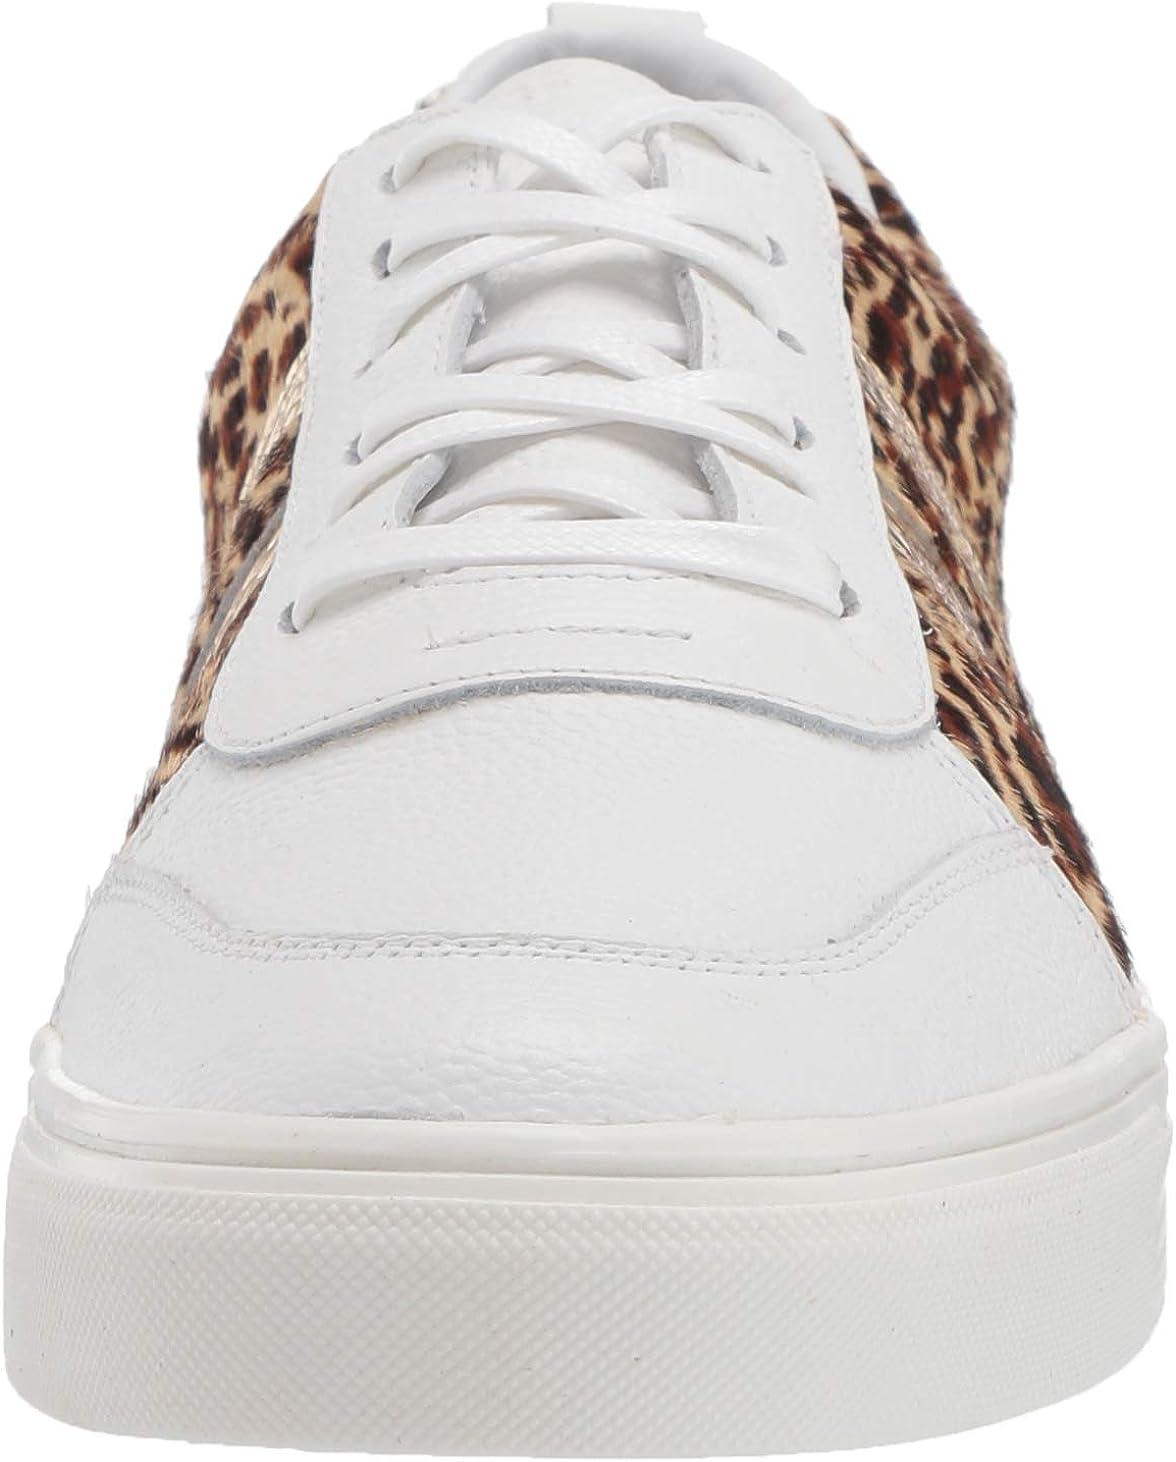 KAANAS Women's Sneaker Cheetah